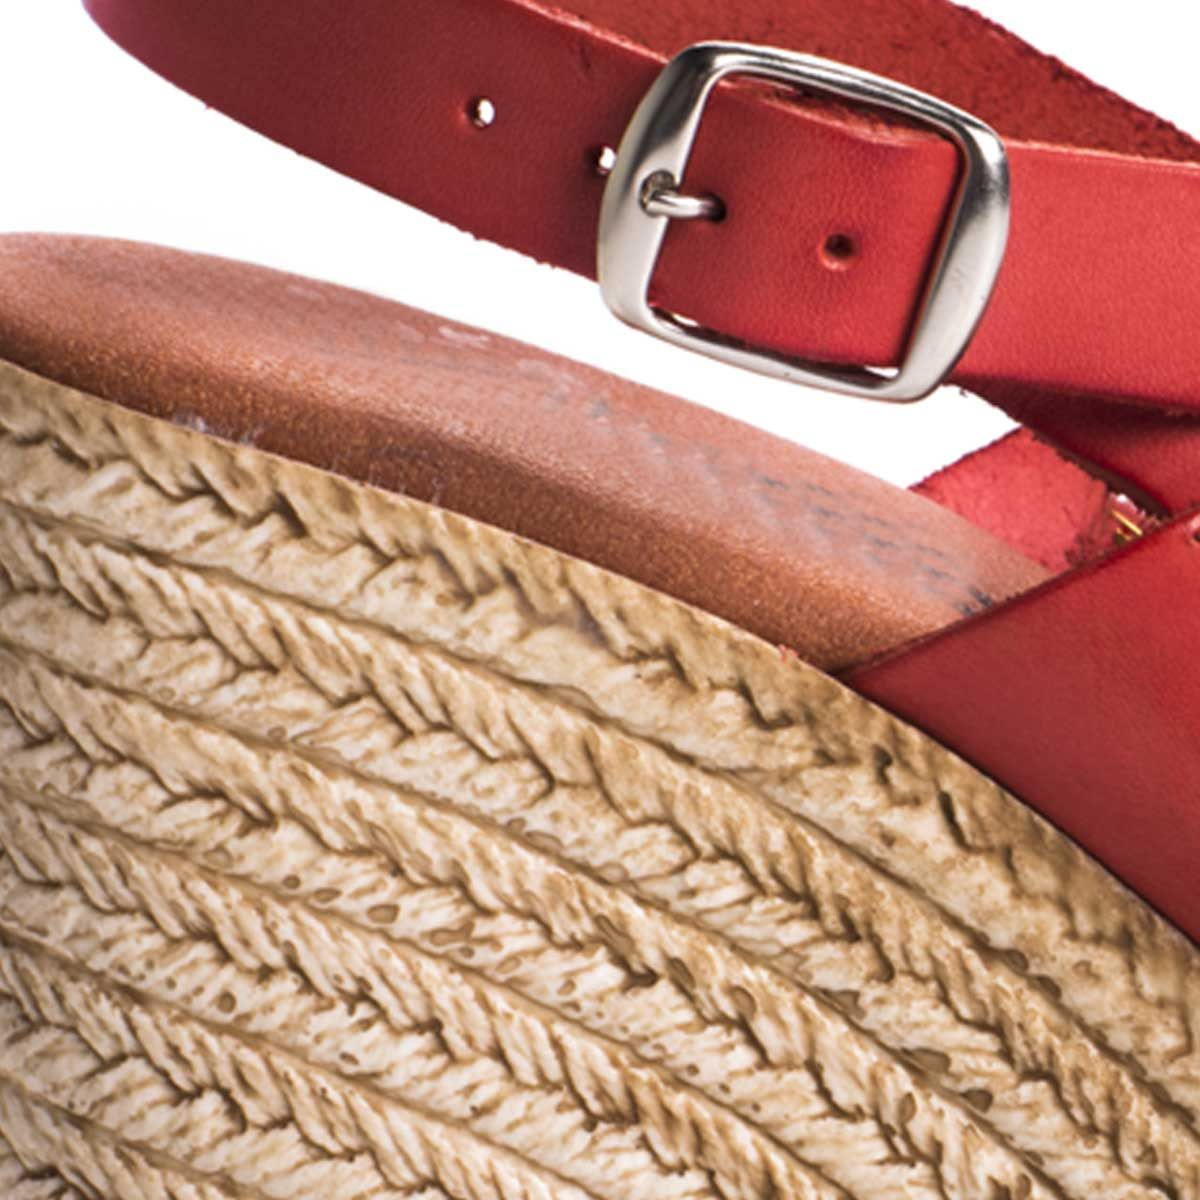 Montevita Platform Sandal in Red